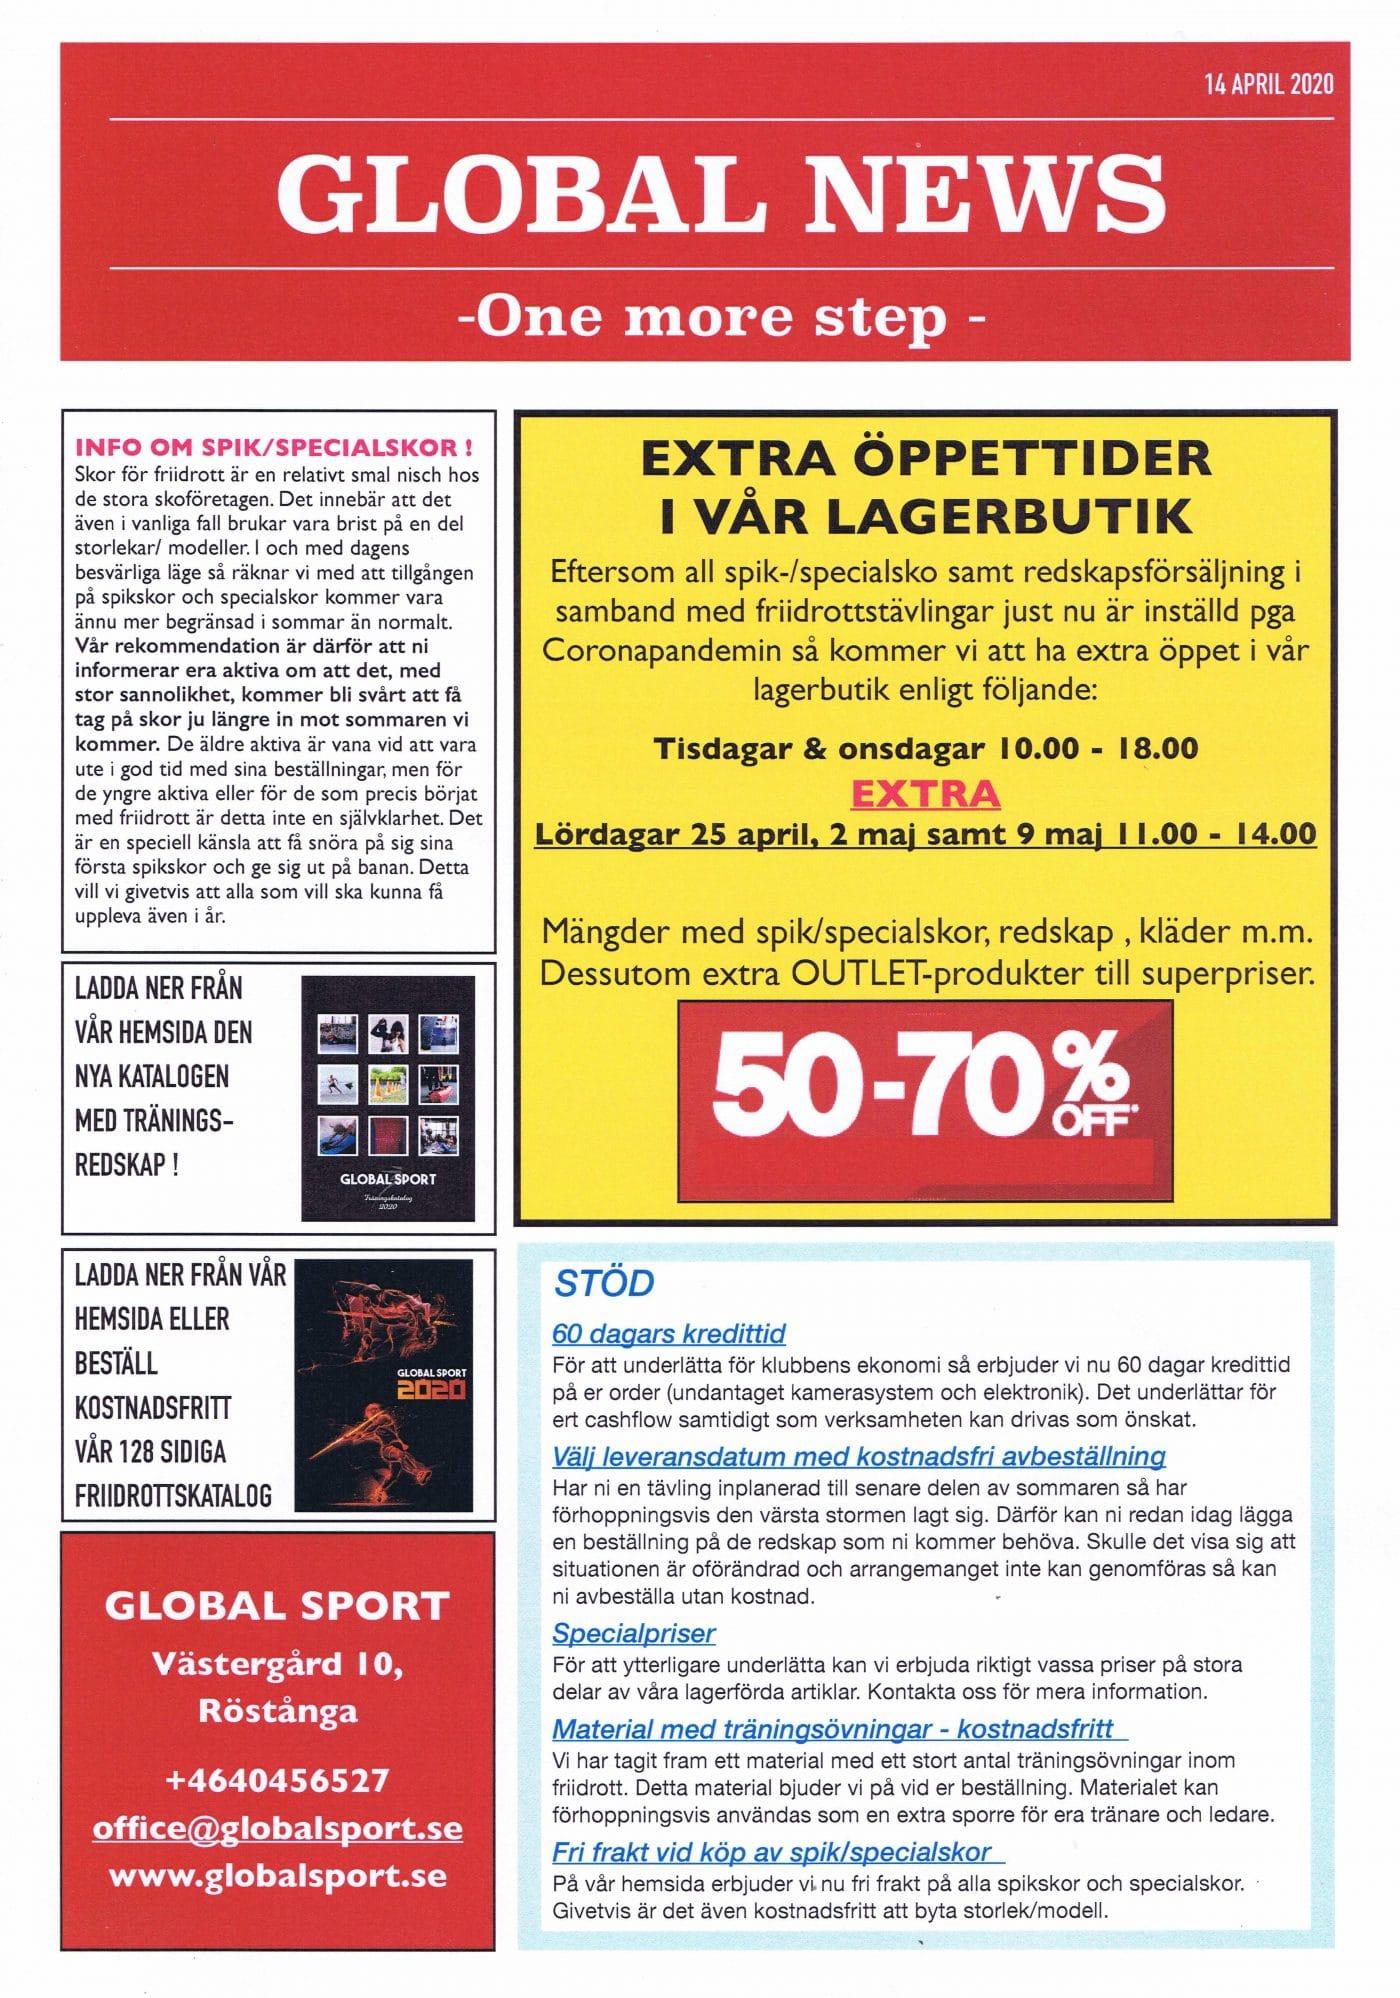 Global Sport News - Viktig information 8